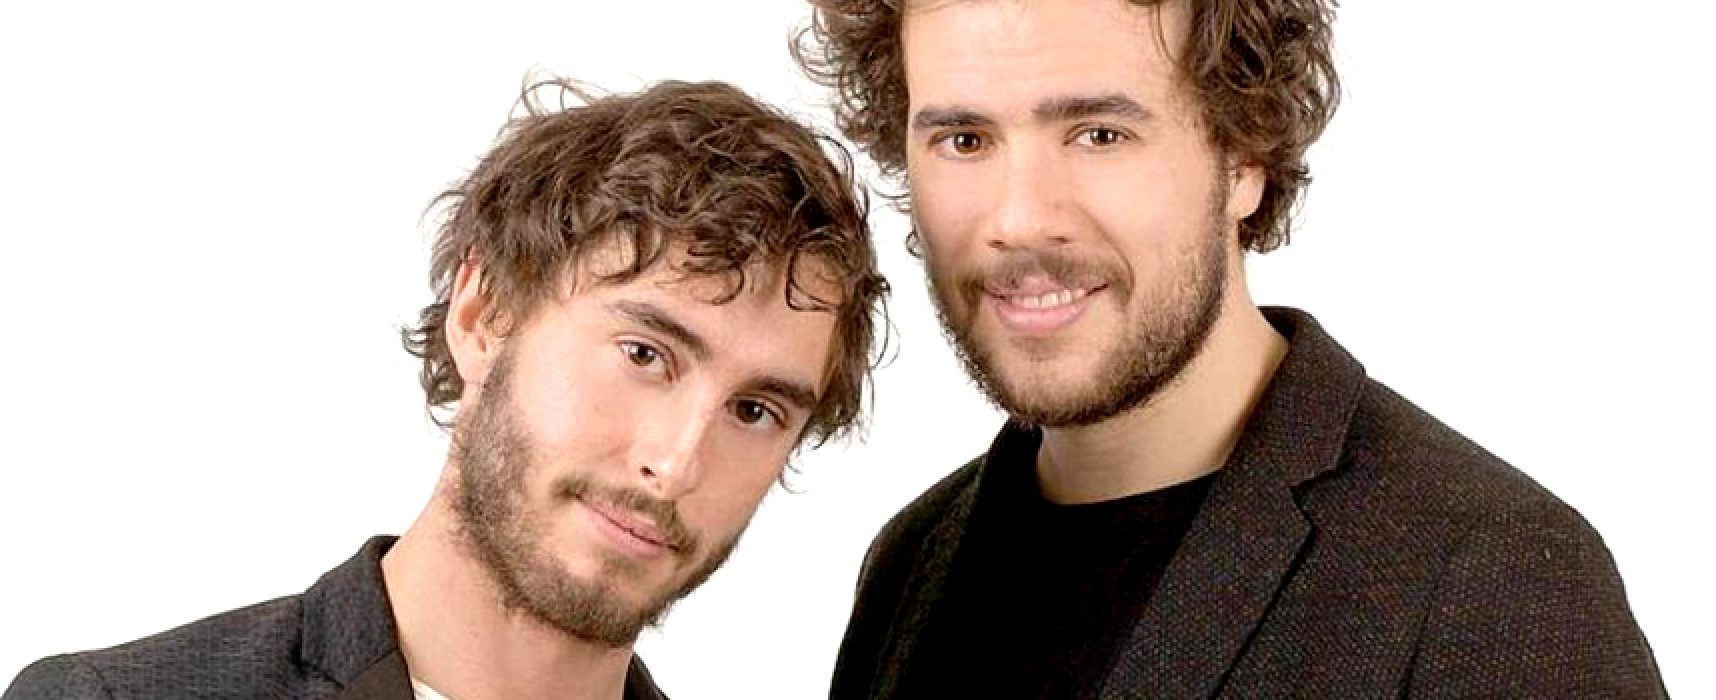 PanPers Live Show, l'esilarante duo comico arriva a Bisceglie per l'unica tappa in Puglia